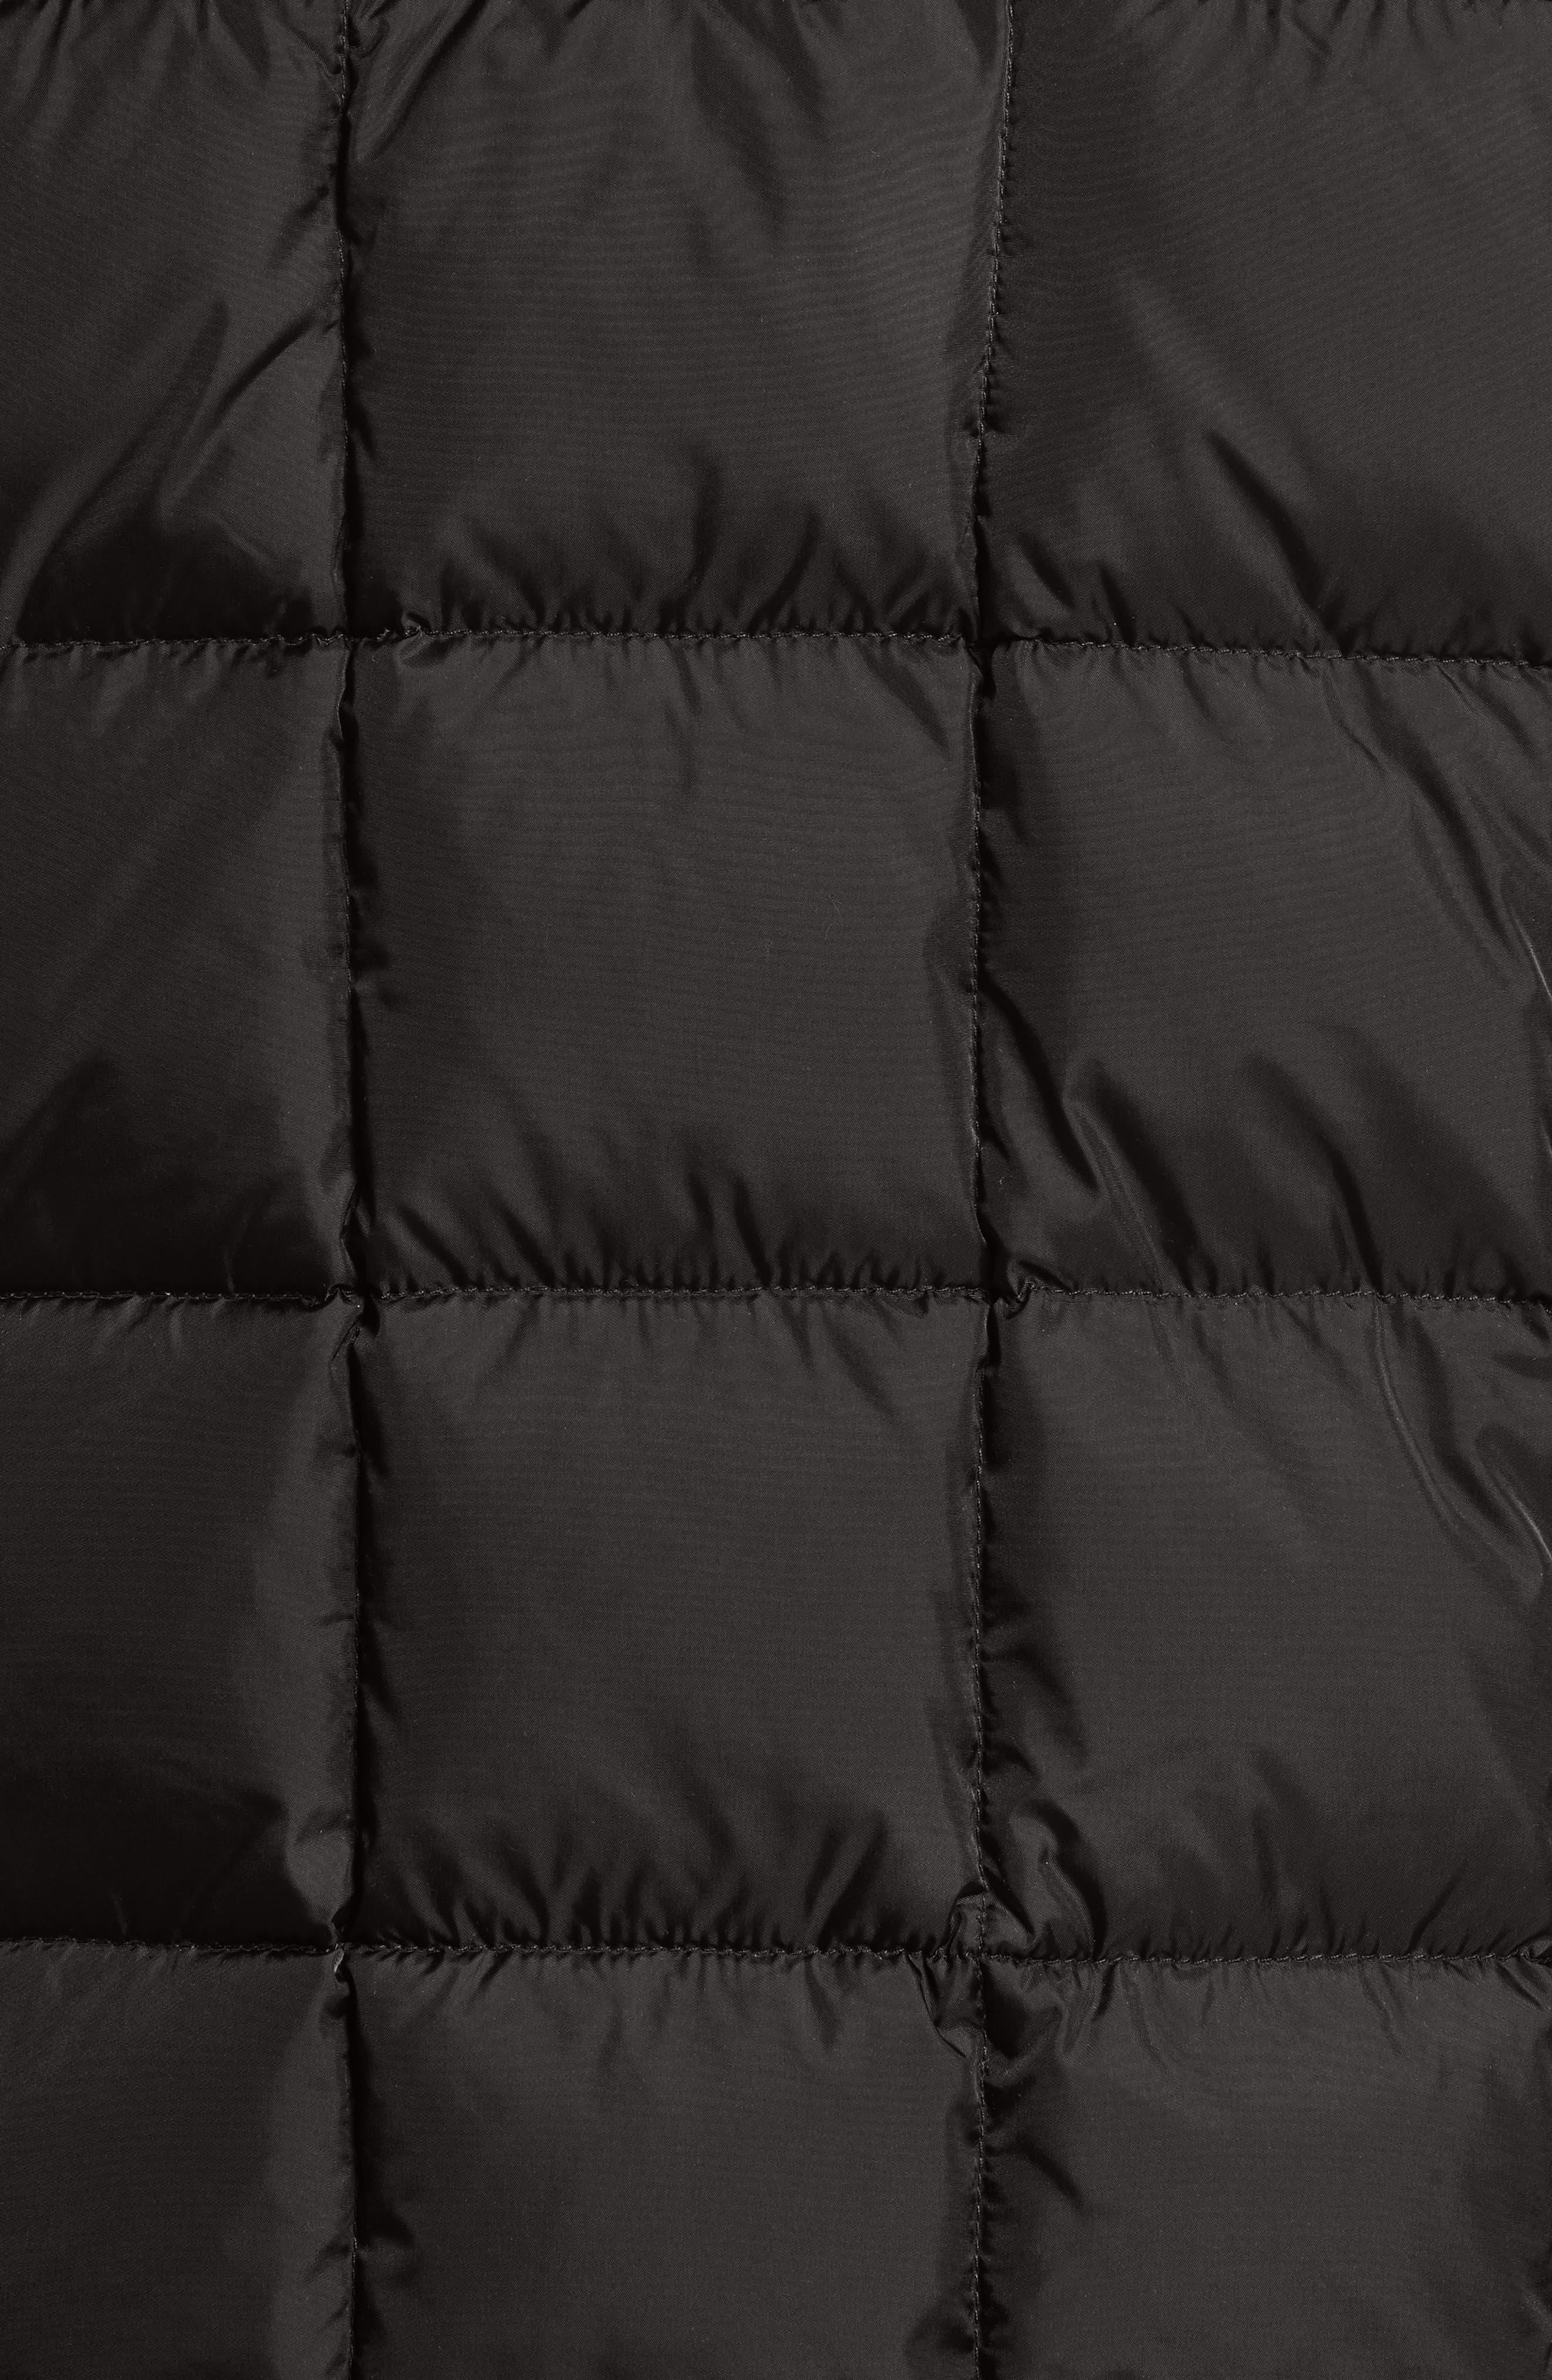 Blais Down Jacket,                             Alternate thumbnail 5, color,                             001